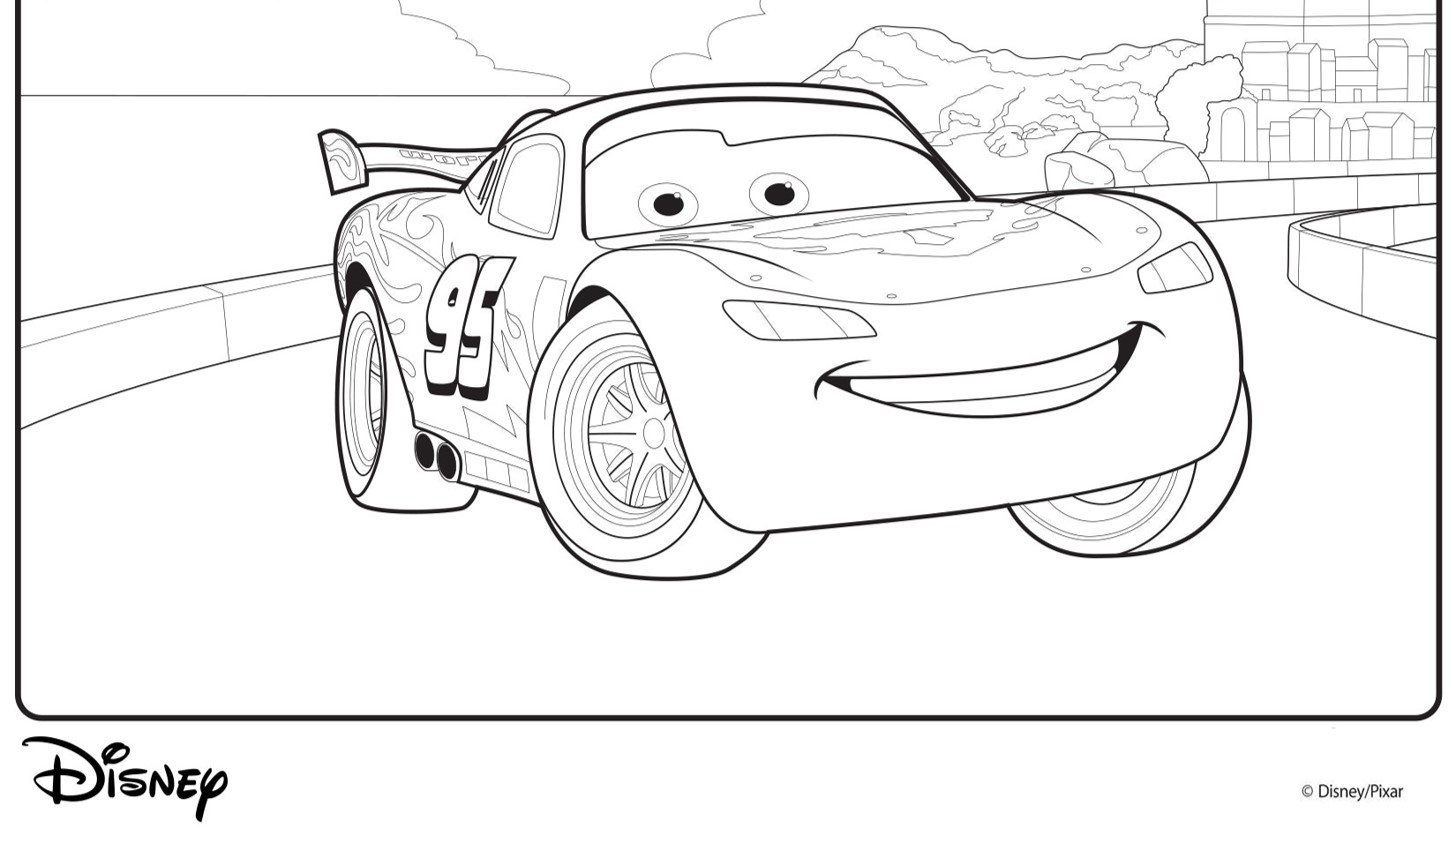 Disney Cars Malvorlagen | Mytoys-Blog verwandt mit Lightning Mcqueen Malvorlage